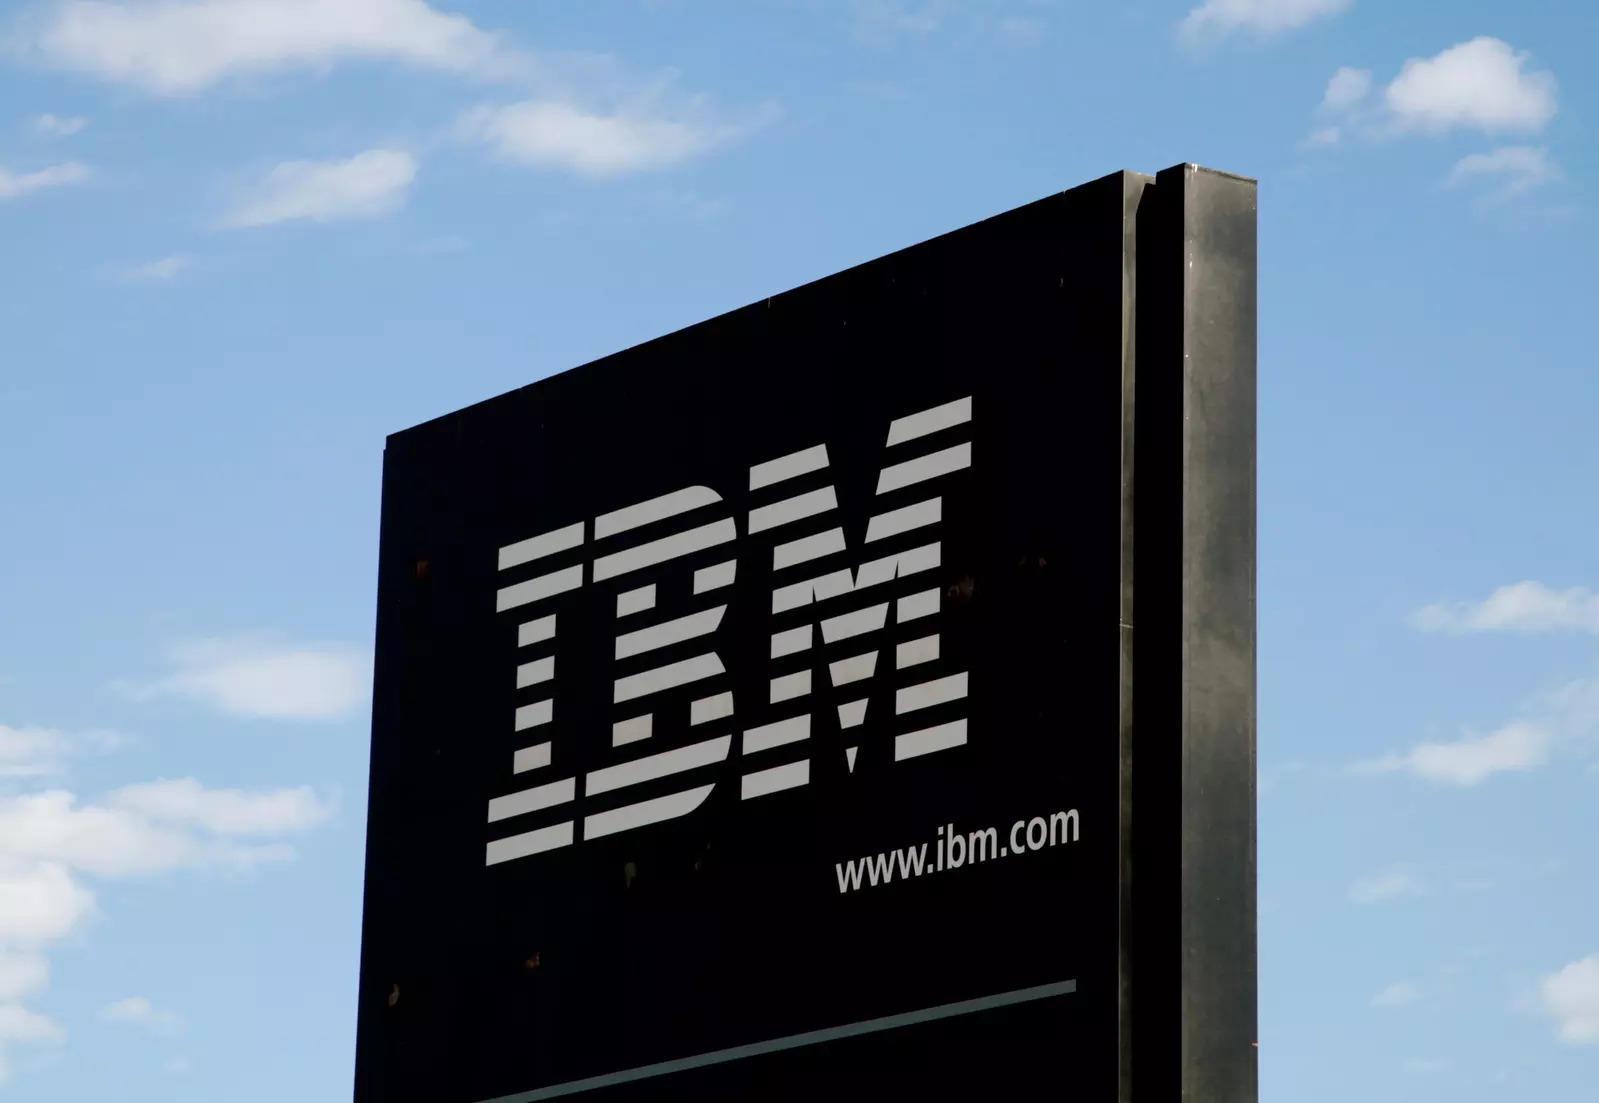 IBM to start office in Kochi soon – ET RealEstate